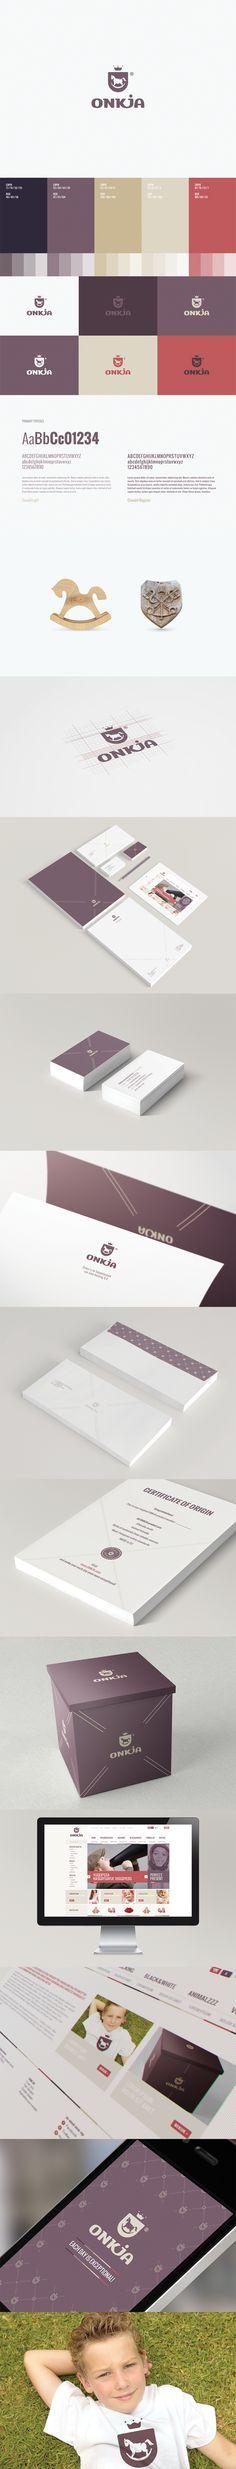 Onkja by Motyf , via Behance